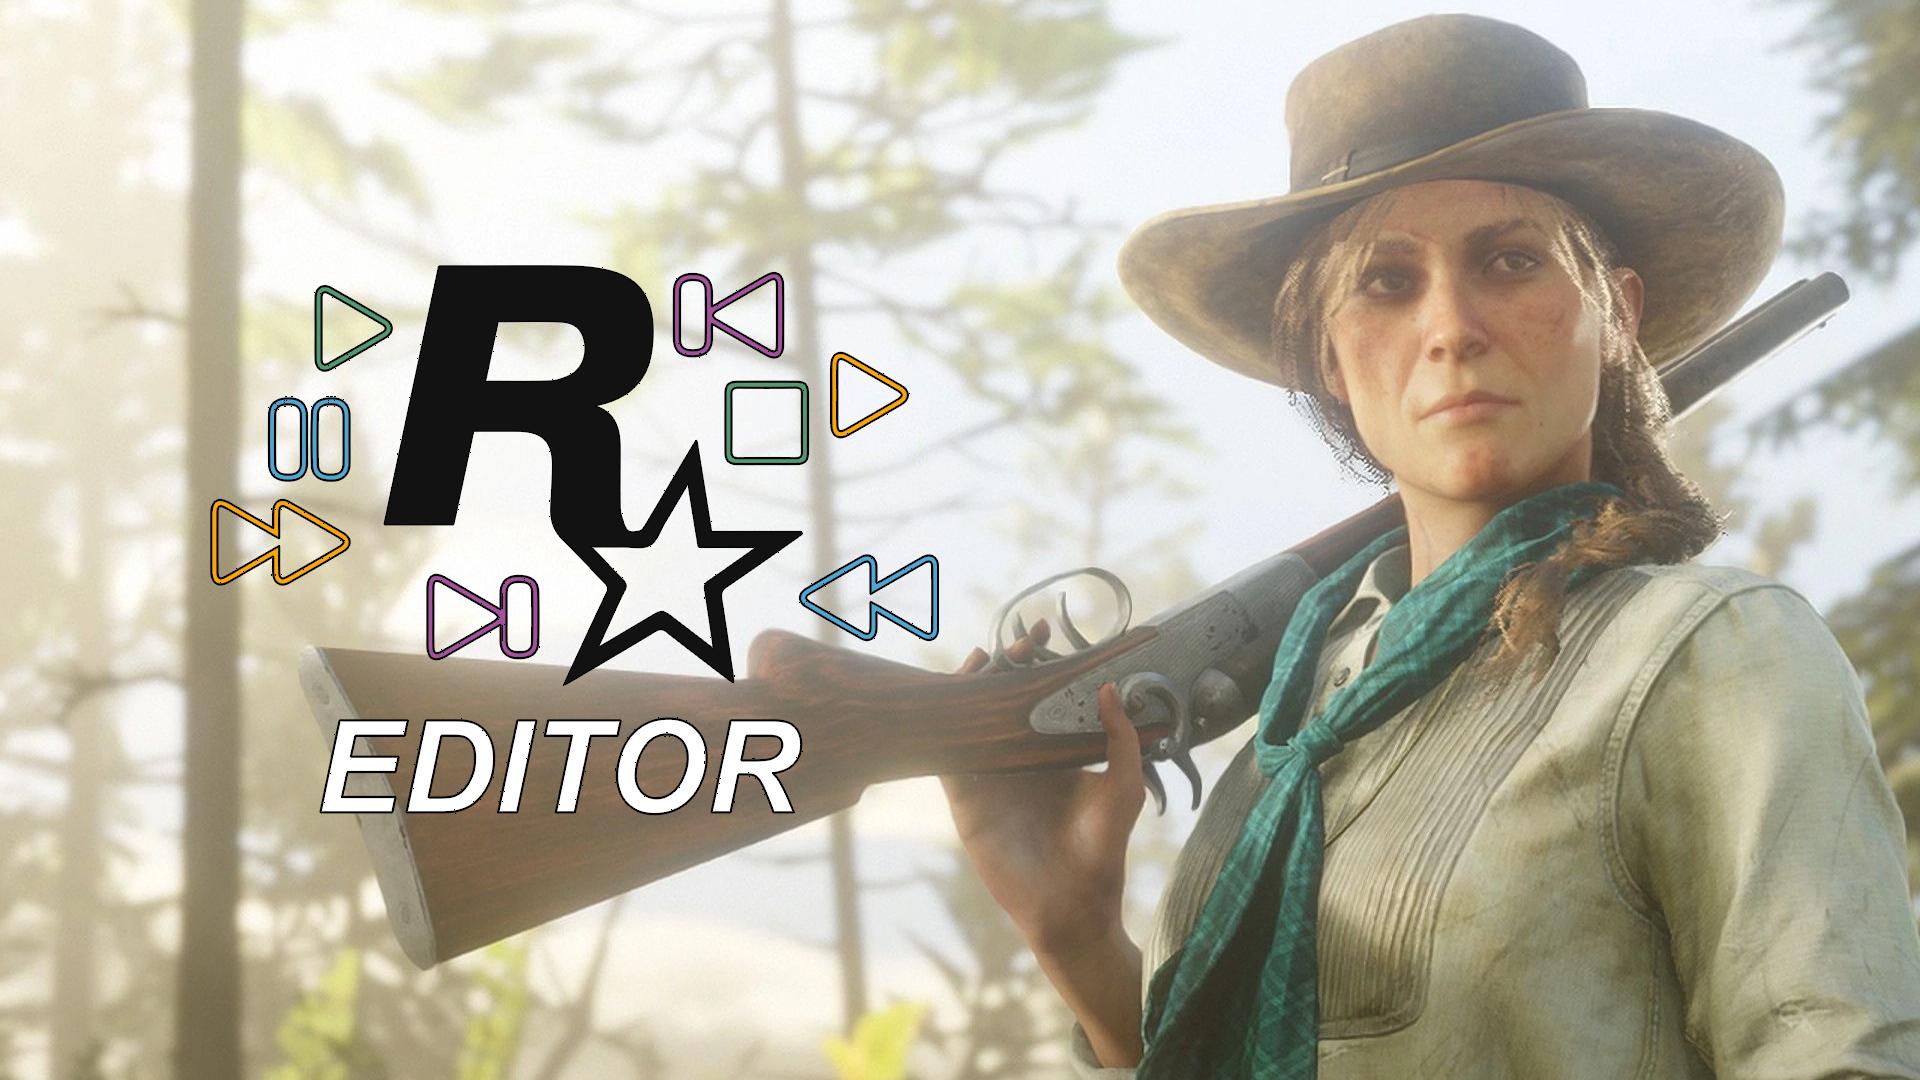 Rockstar Editor Red Dead Redemption II